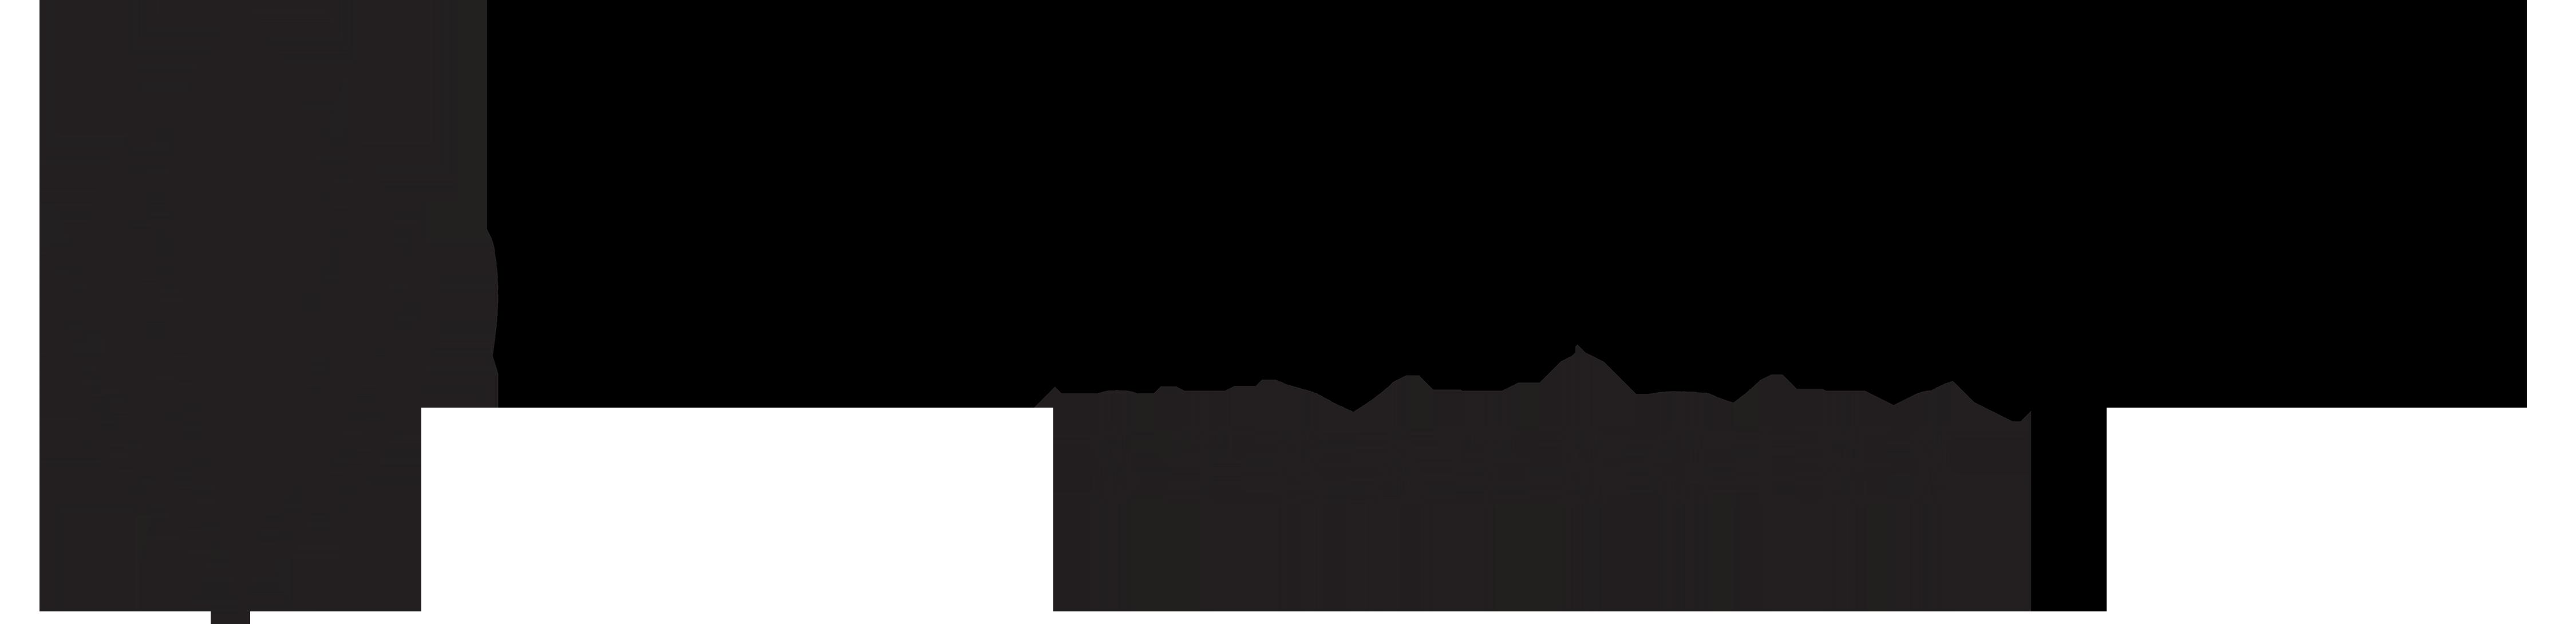 MetropolitanStrategies.com